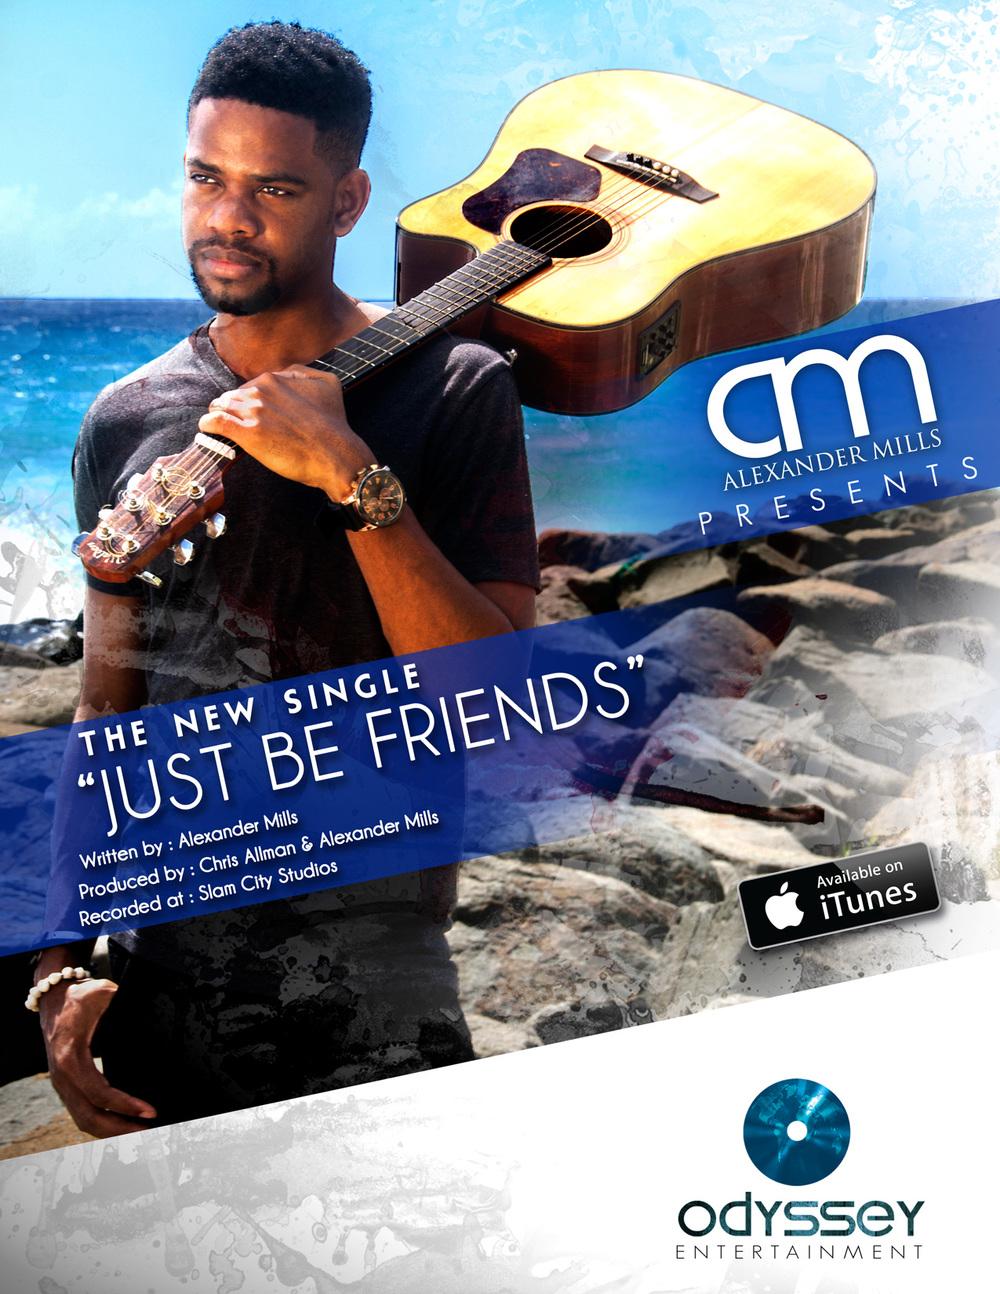 https://itunes.apple.com/au/album/just-be-friends/id1114921192?i=1114921370